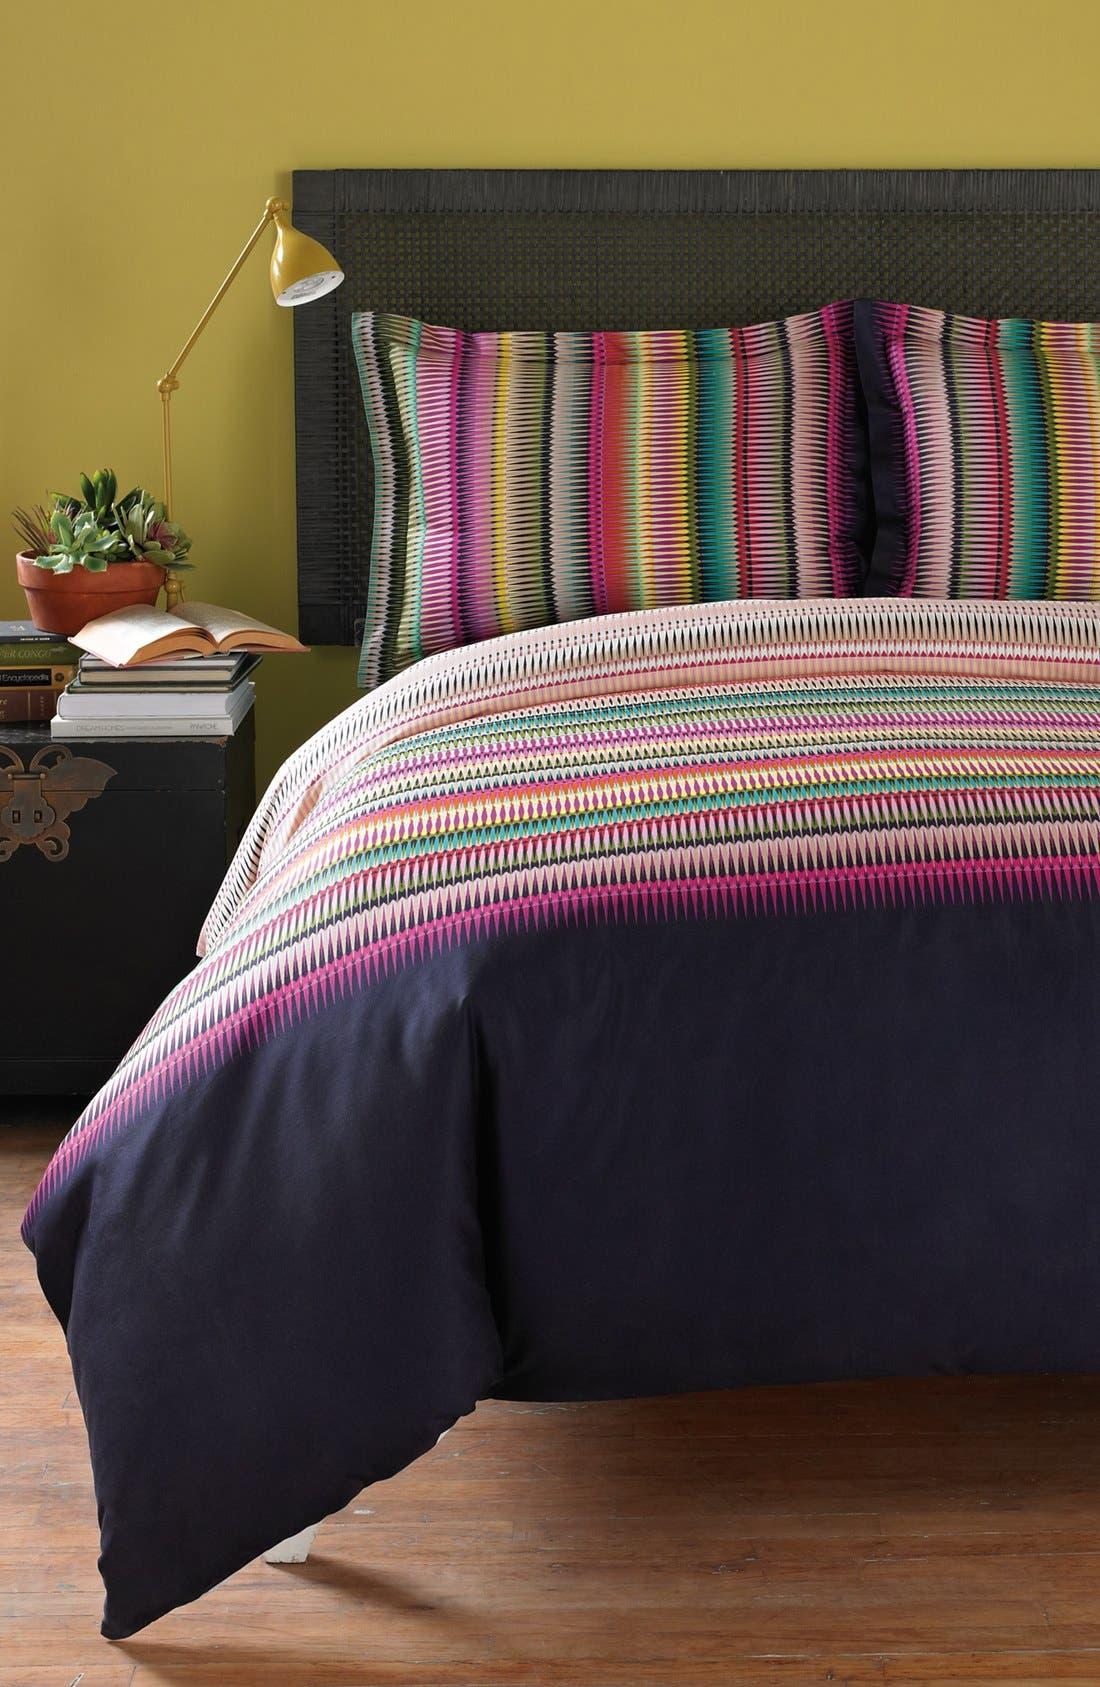 Alternate Image 1 Selected - KAS Designs 'Indio' Duvet Cover (Online Only)